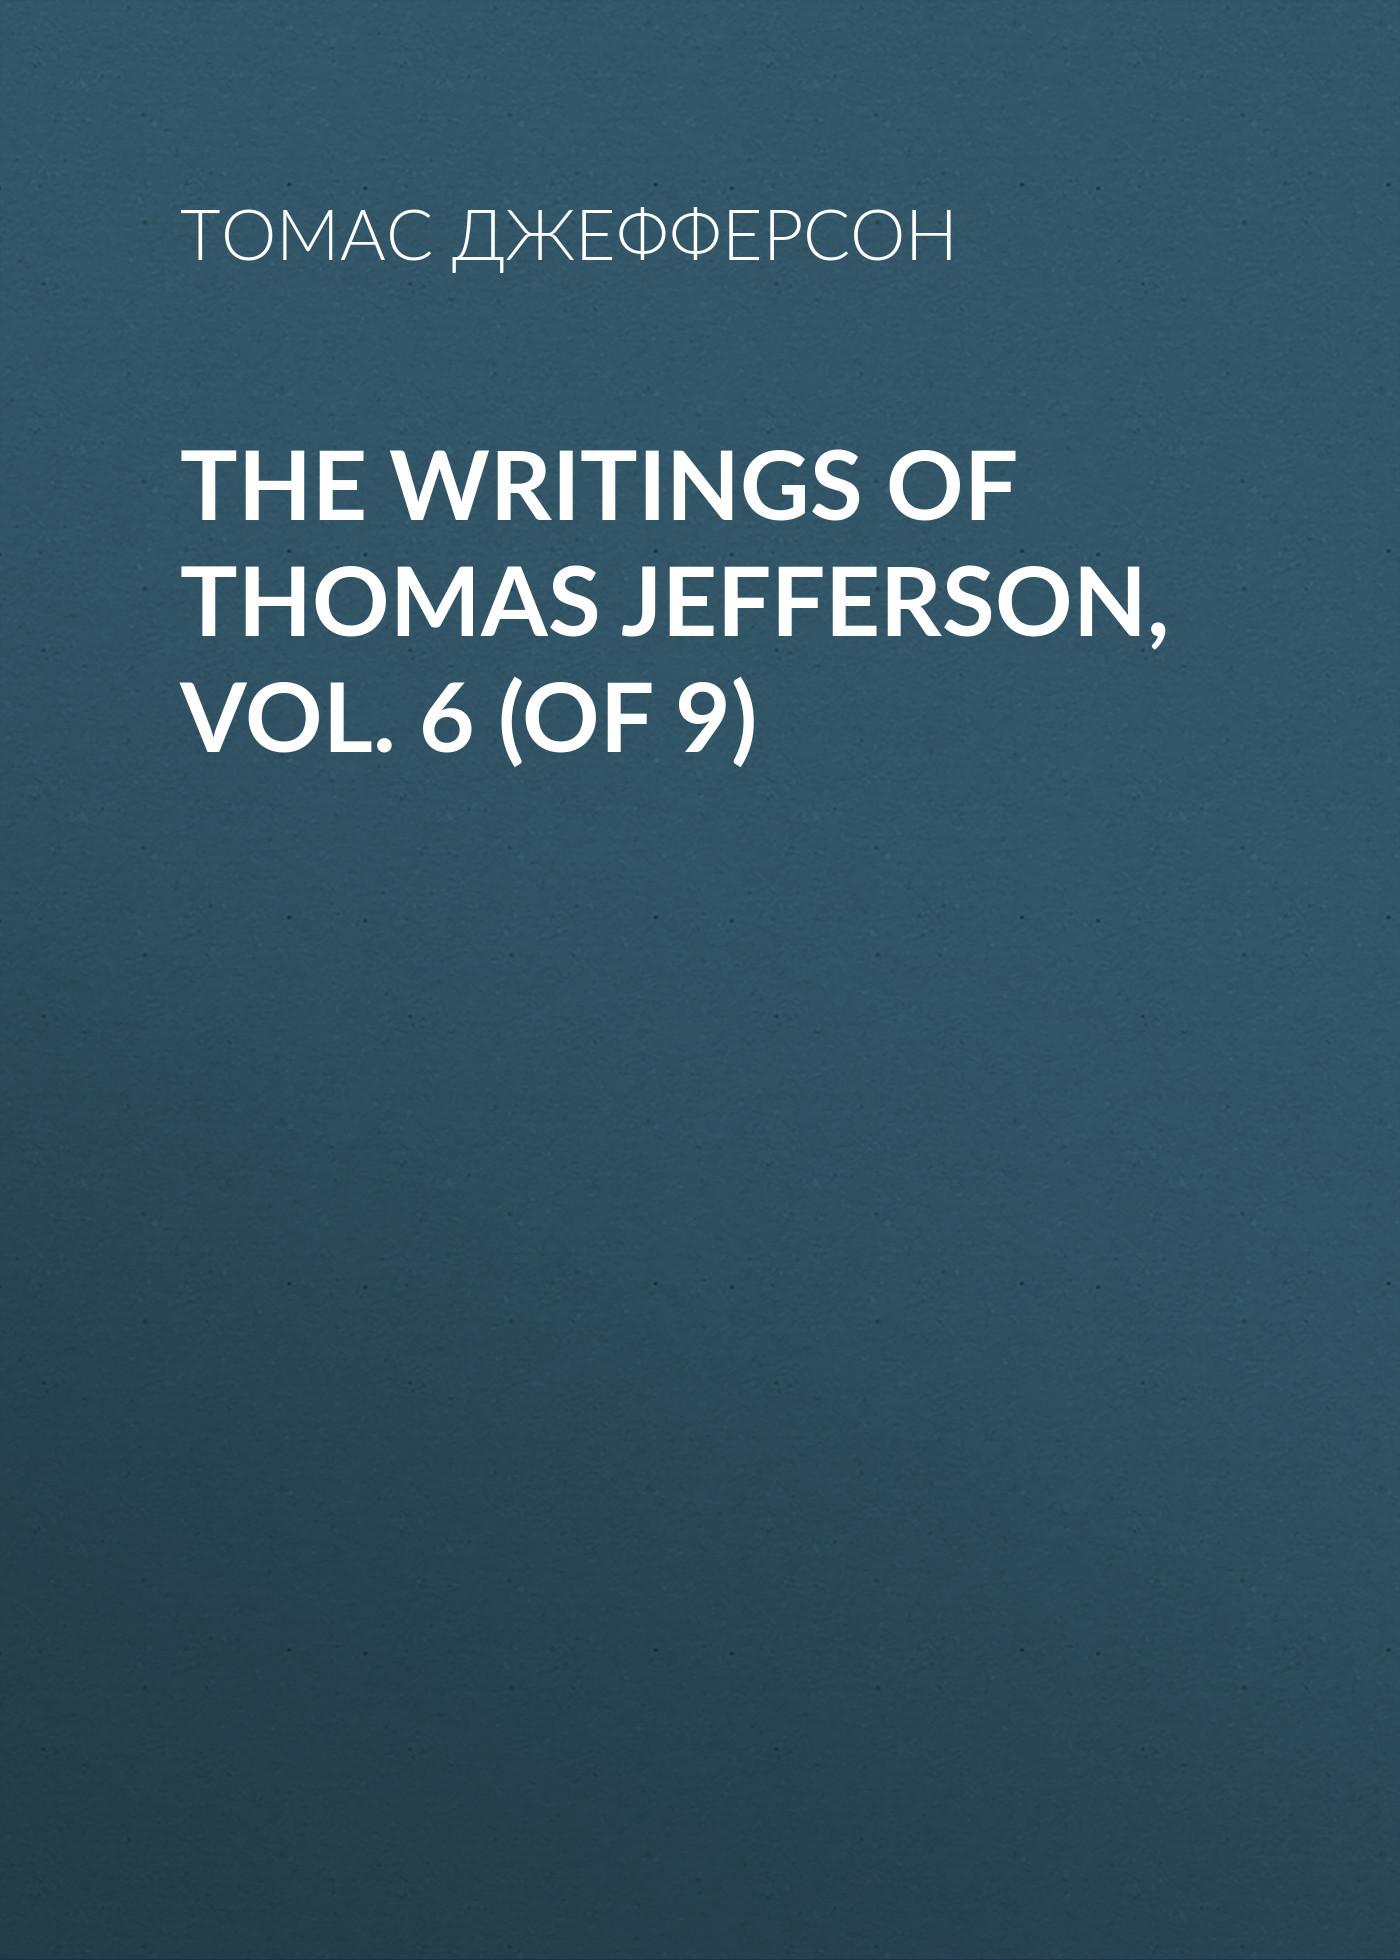 Томас Джефферсон The Writings of Thomas Jefferson, Vol. 6 (of 9) direct heating n16e gt a1 n16e gx a1 n15e gx a2 n15e gt a2 stencil